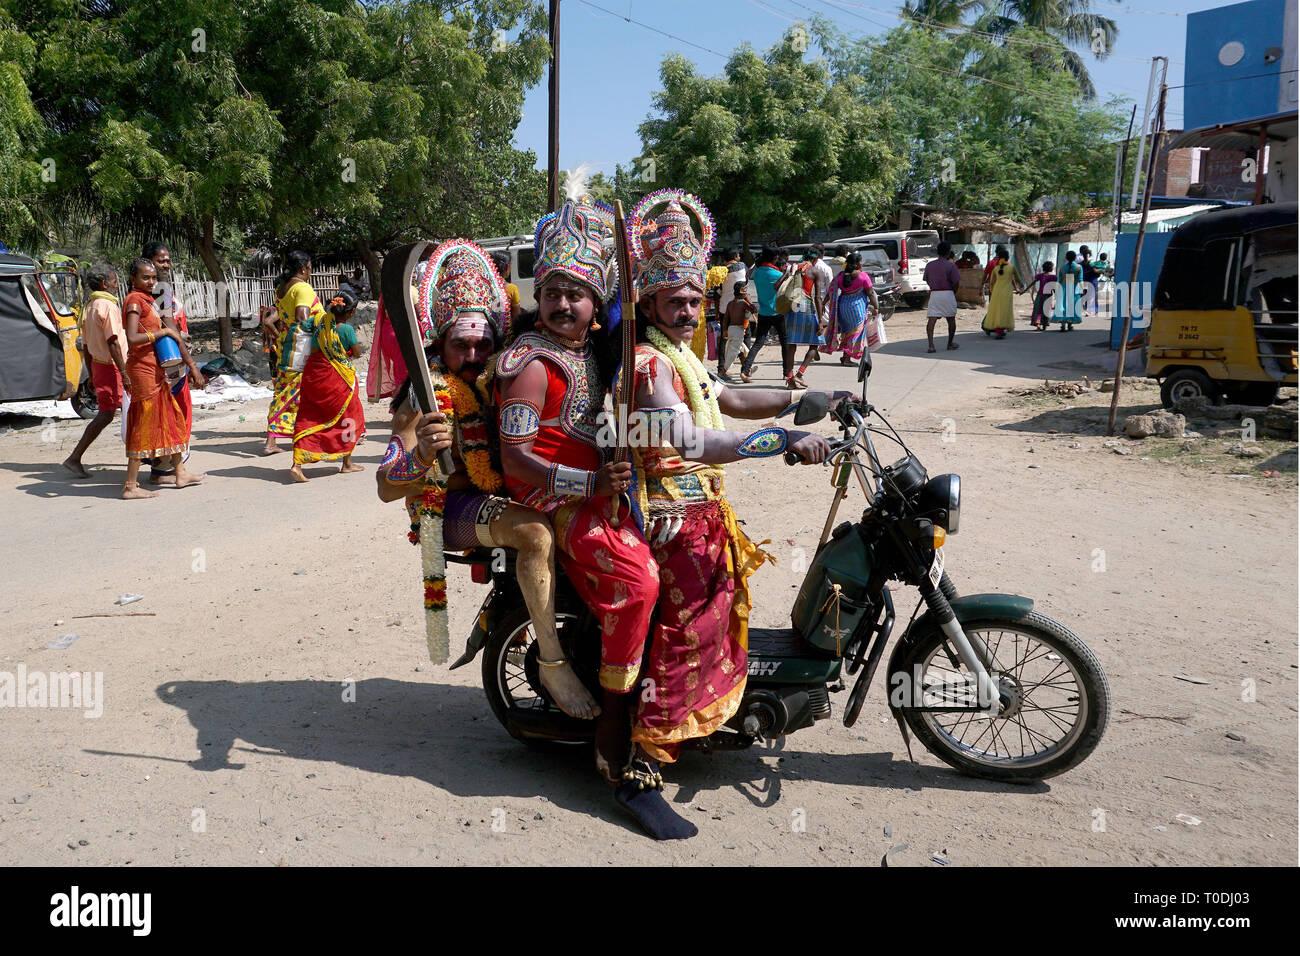 men dress as Hindu Gods near Mutharamman temple, Tamil Nadu, India, Asia - Stock Image